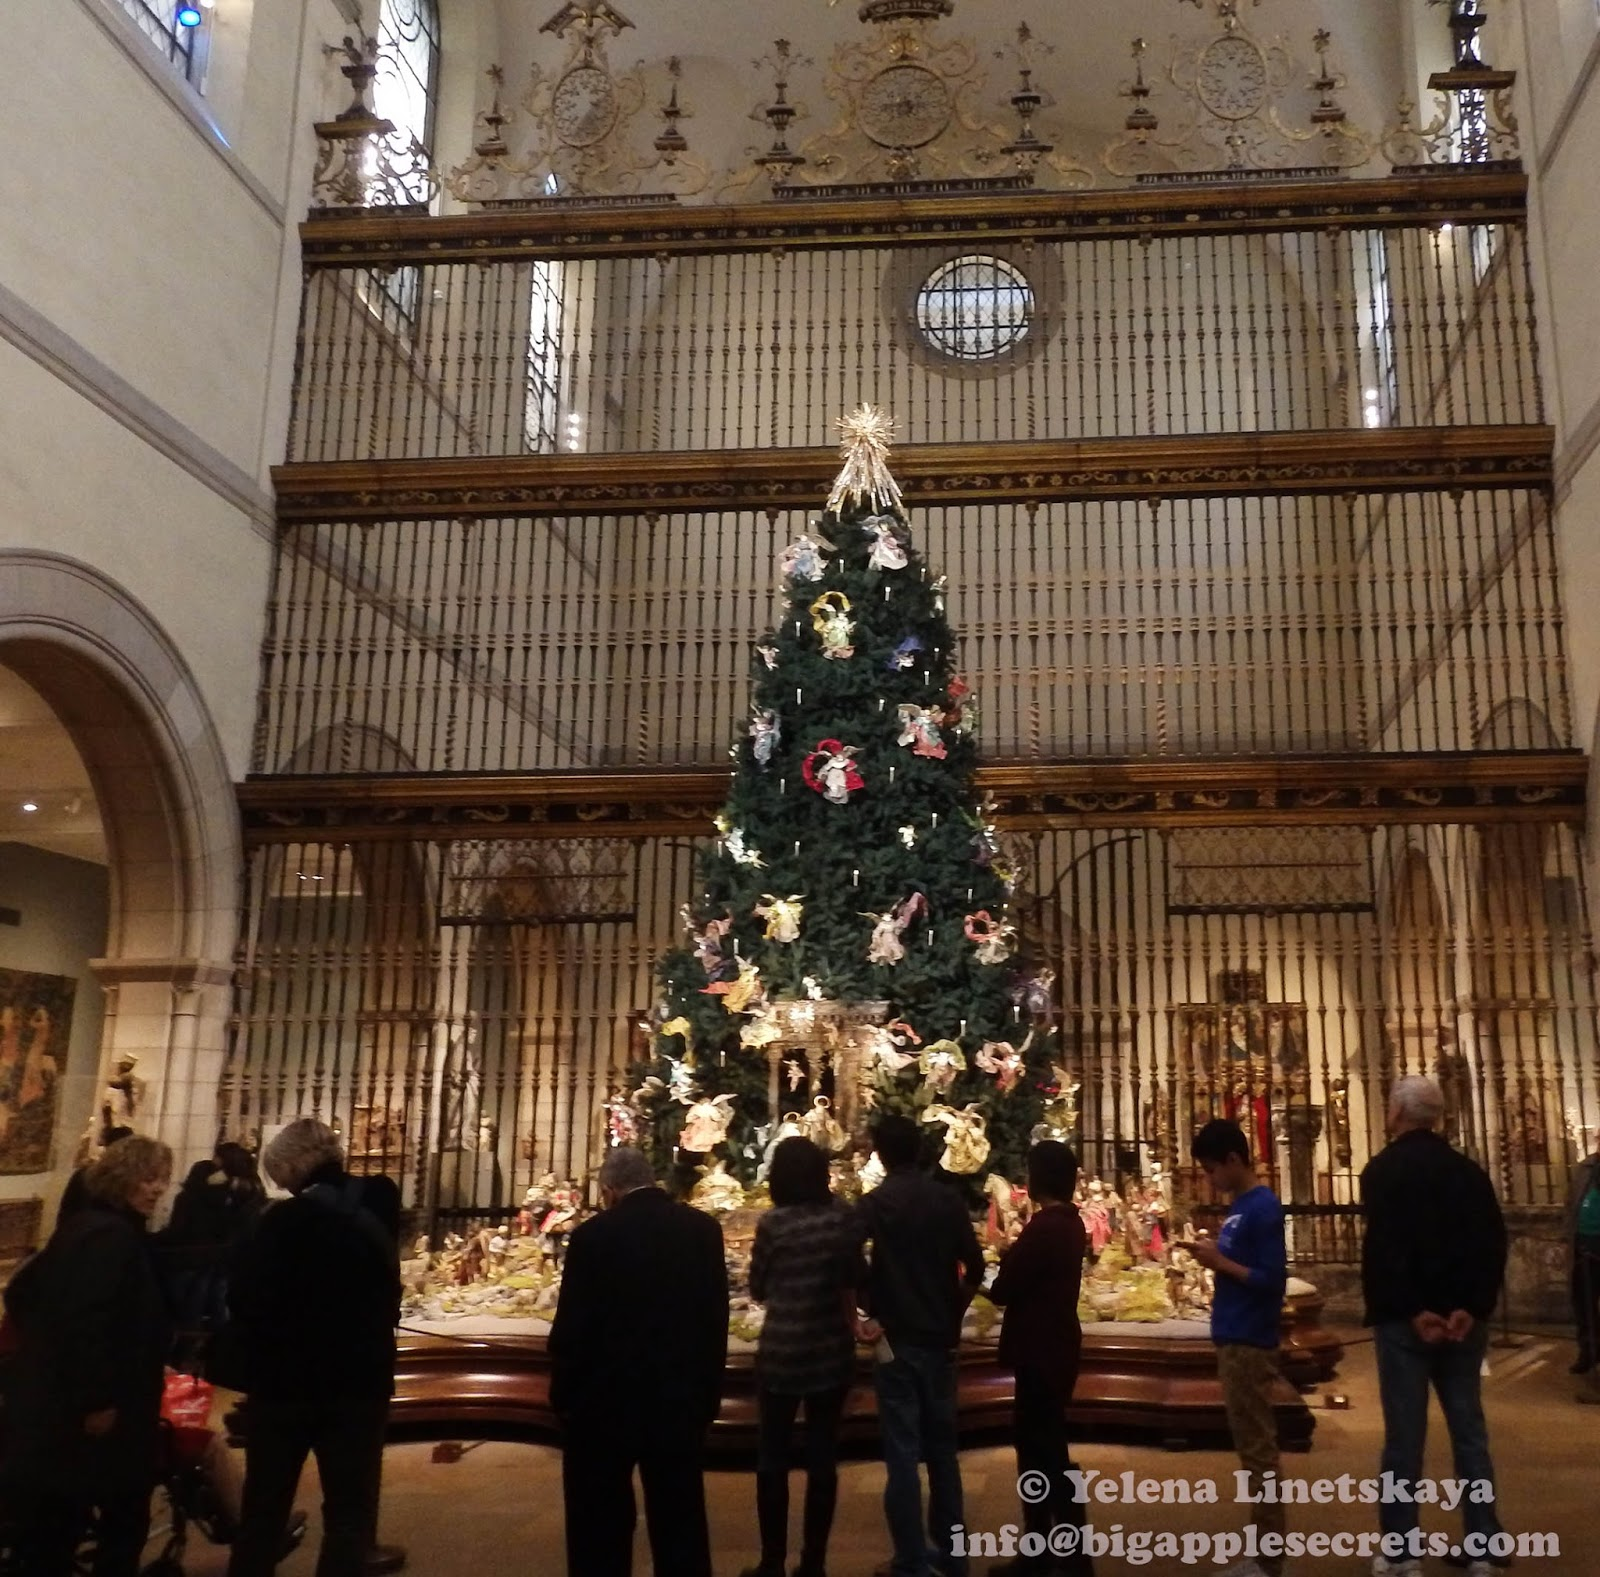 Big Apple Secrets Metropolitan Museum Of Art's' Christmas Tree - Medieval Christmas Tree